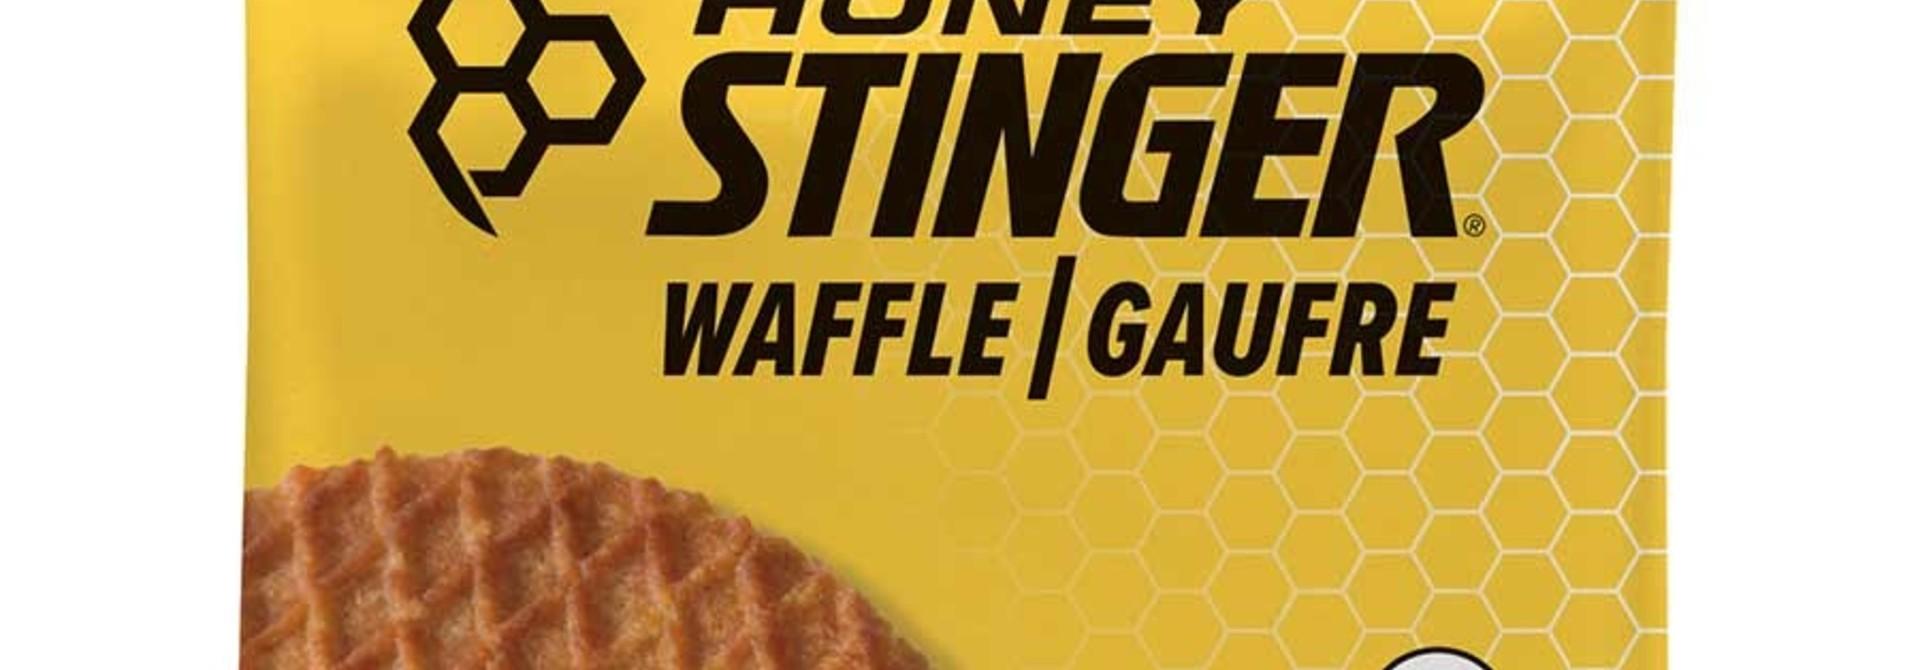 Honey Stinger Waffles